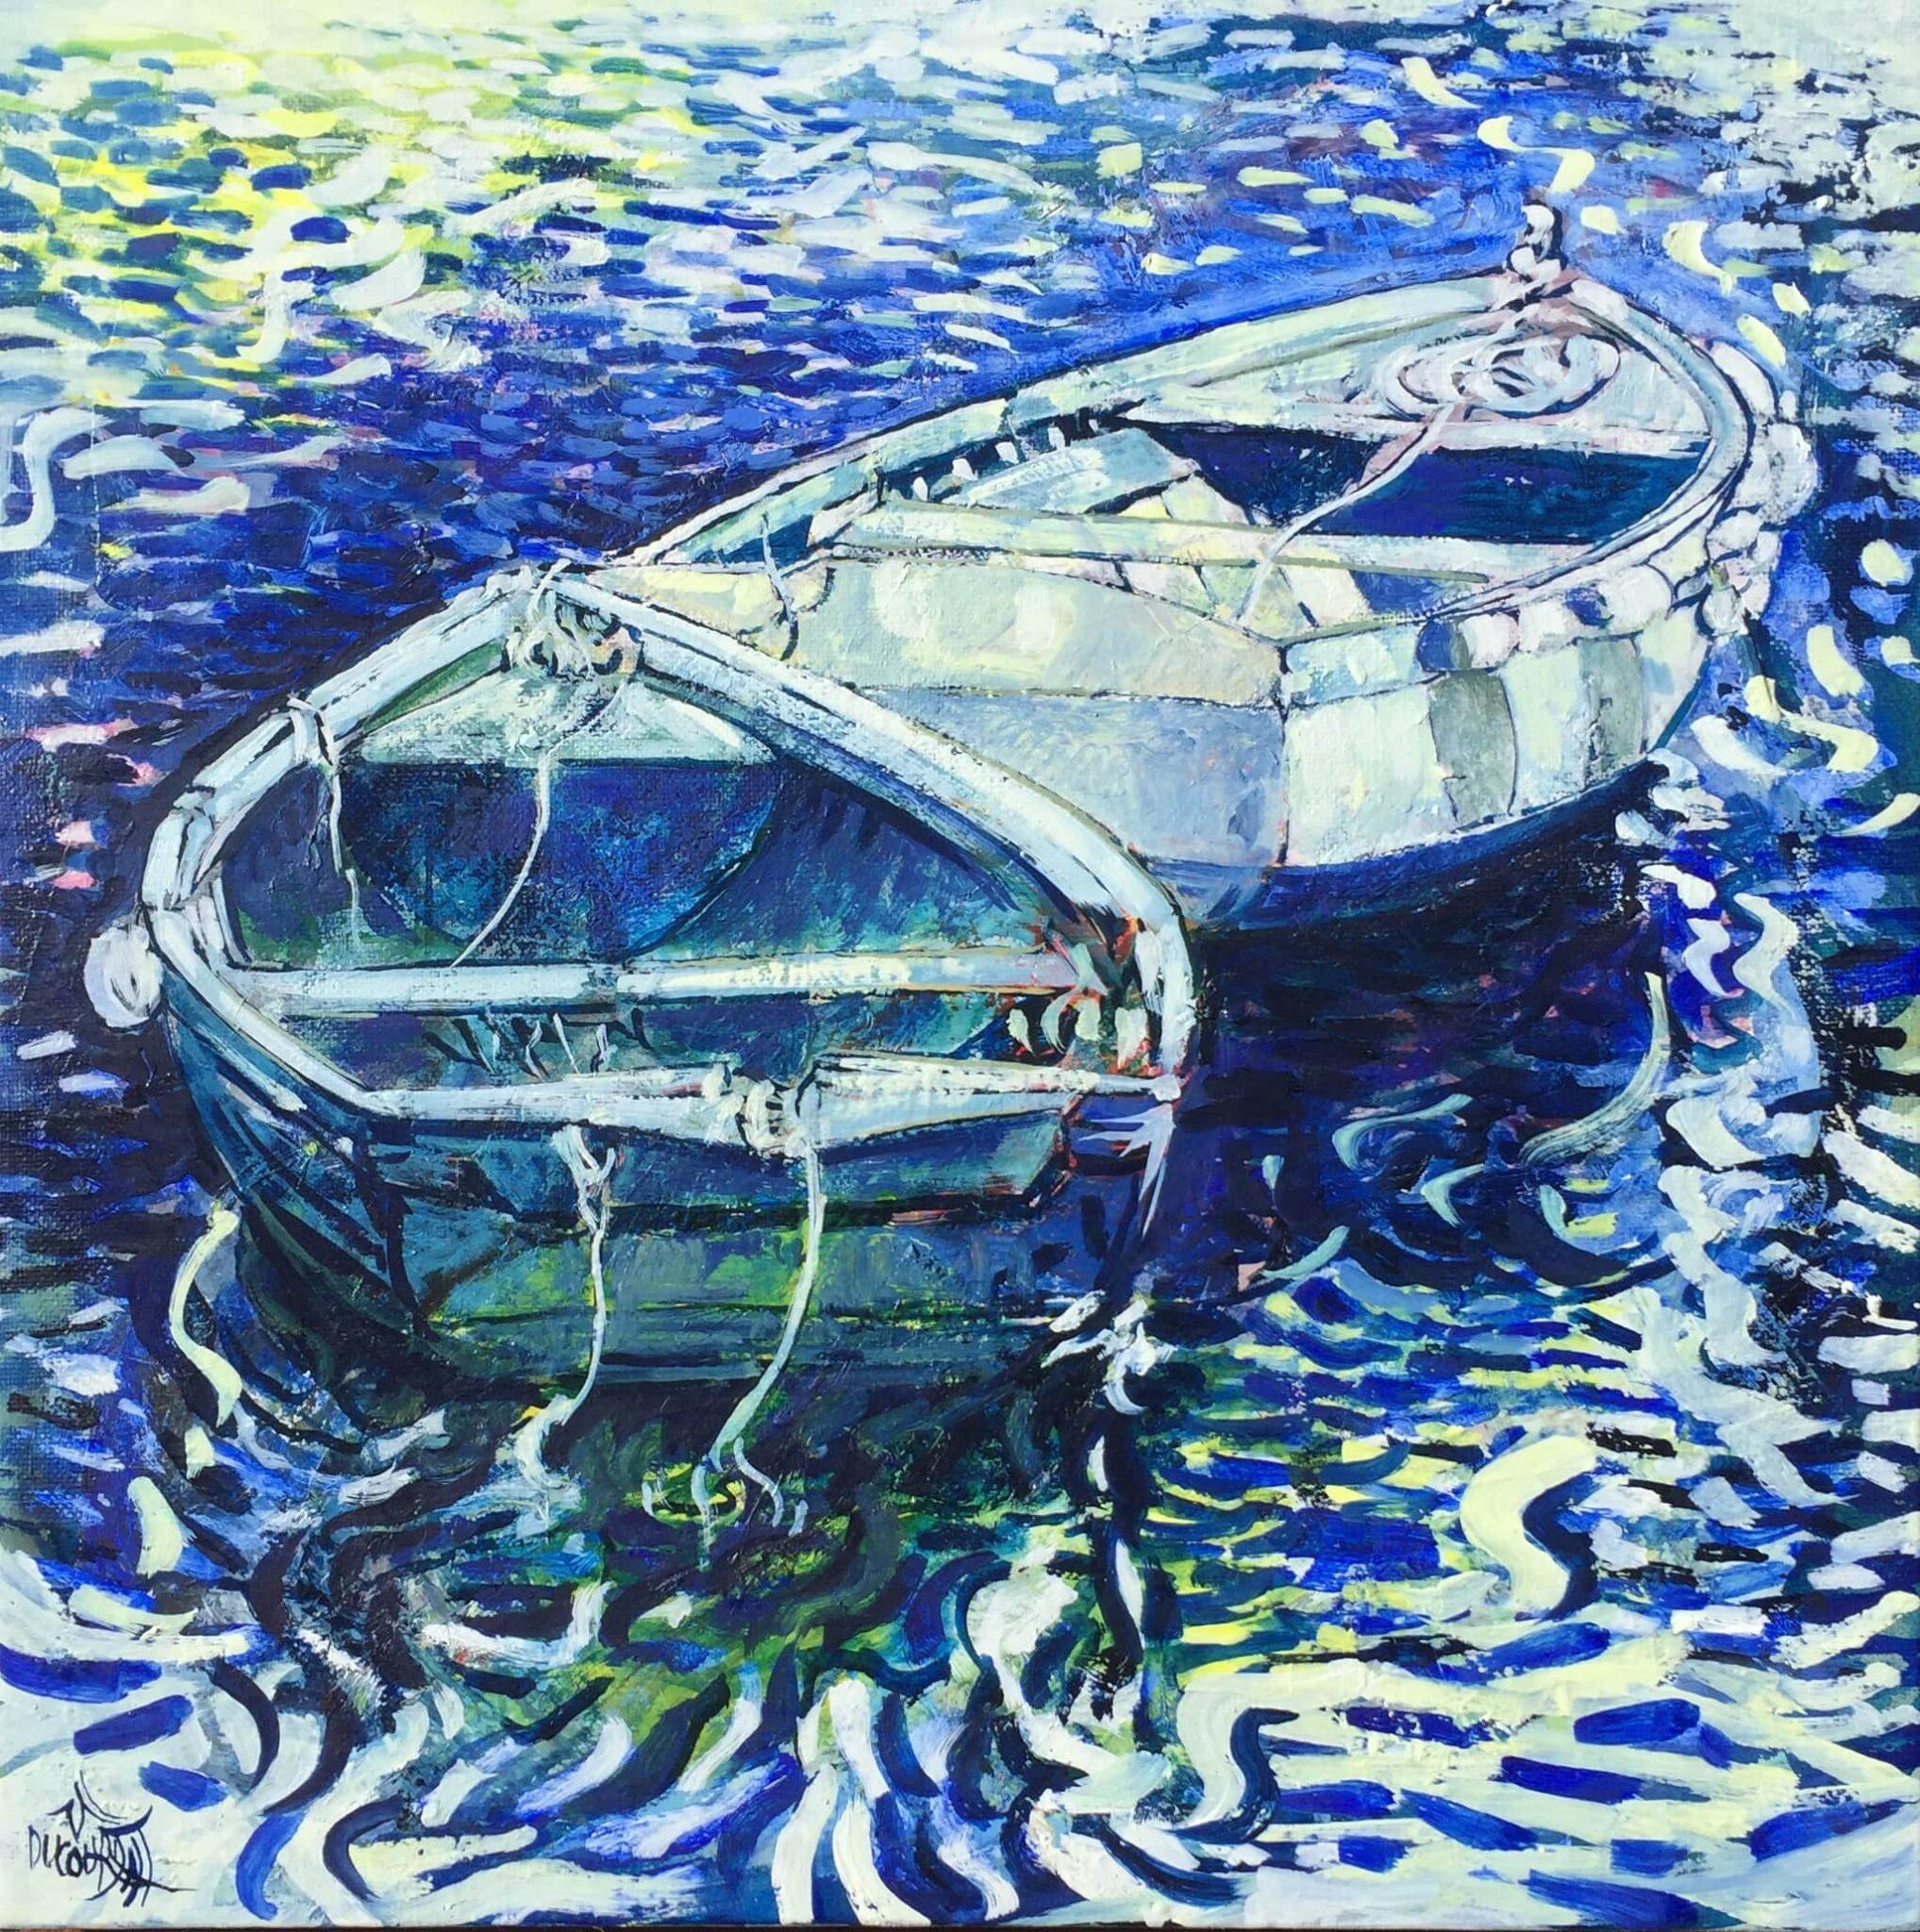 Les menus plaisirs des barques d'Aven - 40x40